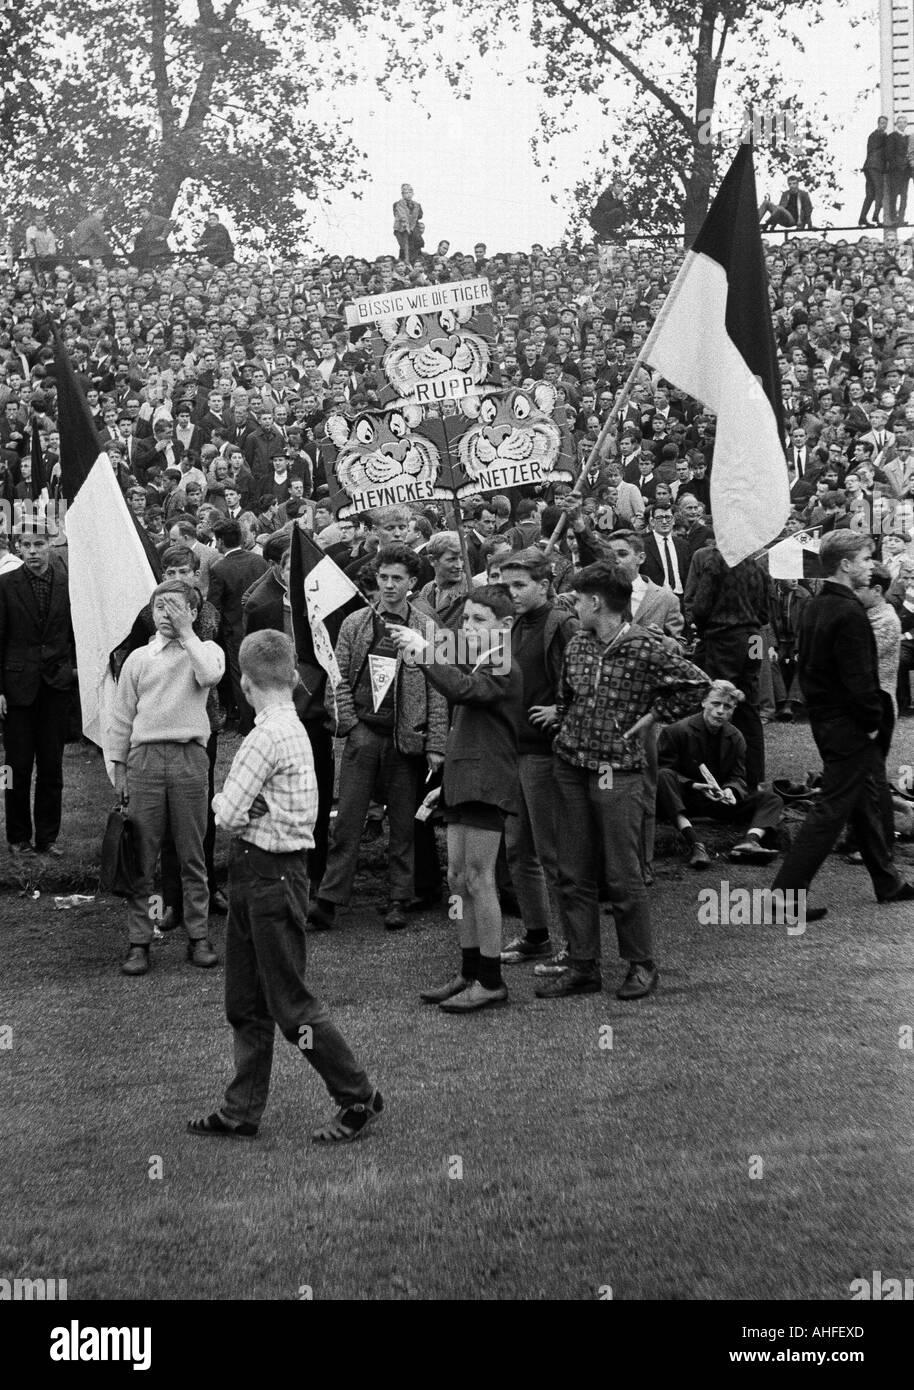 football, Bundesliga, 1965/1966, FC Schalke 04 versus Borussia Moenchengladbach 0:0, Glueckaufkampfbahn Stadium, crowd of spectators, Gladbach fans - Stock Image